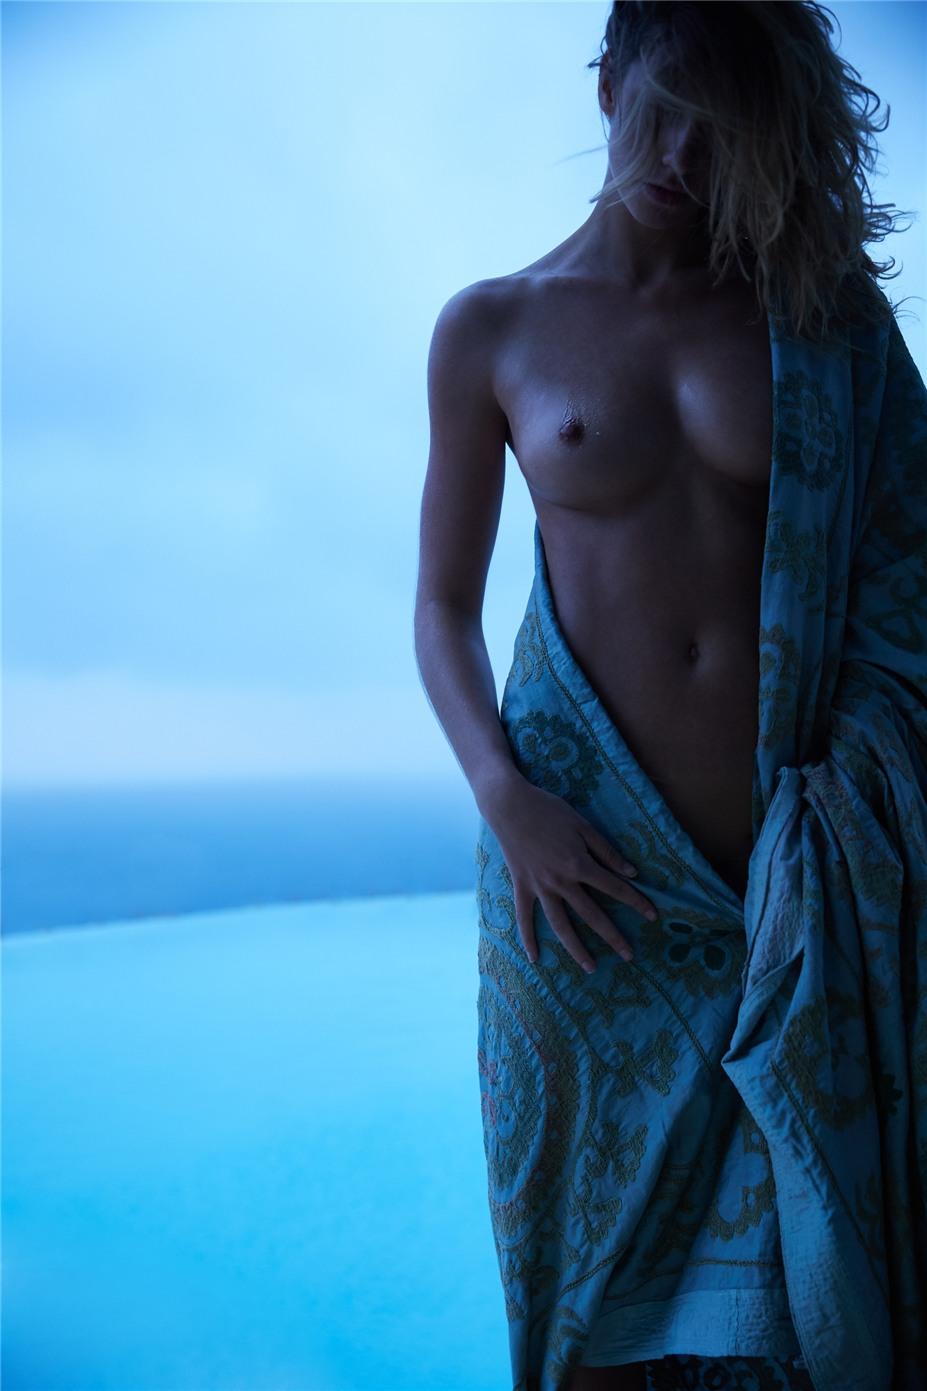 Обнаженные девушки на пляжах Ибицы / Ibiza Nudes by Diane Betties - Alice